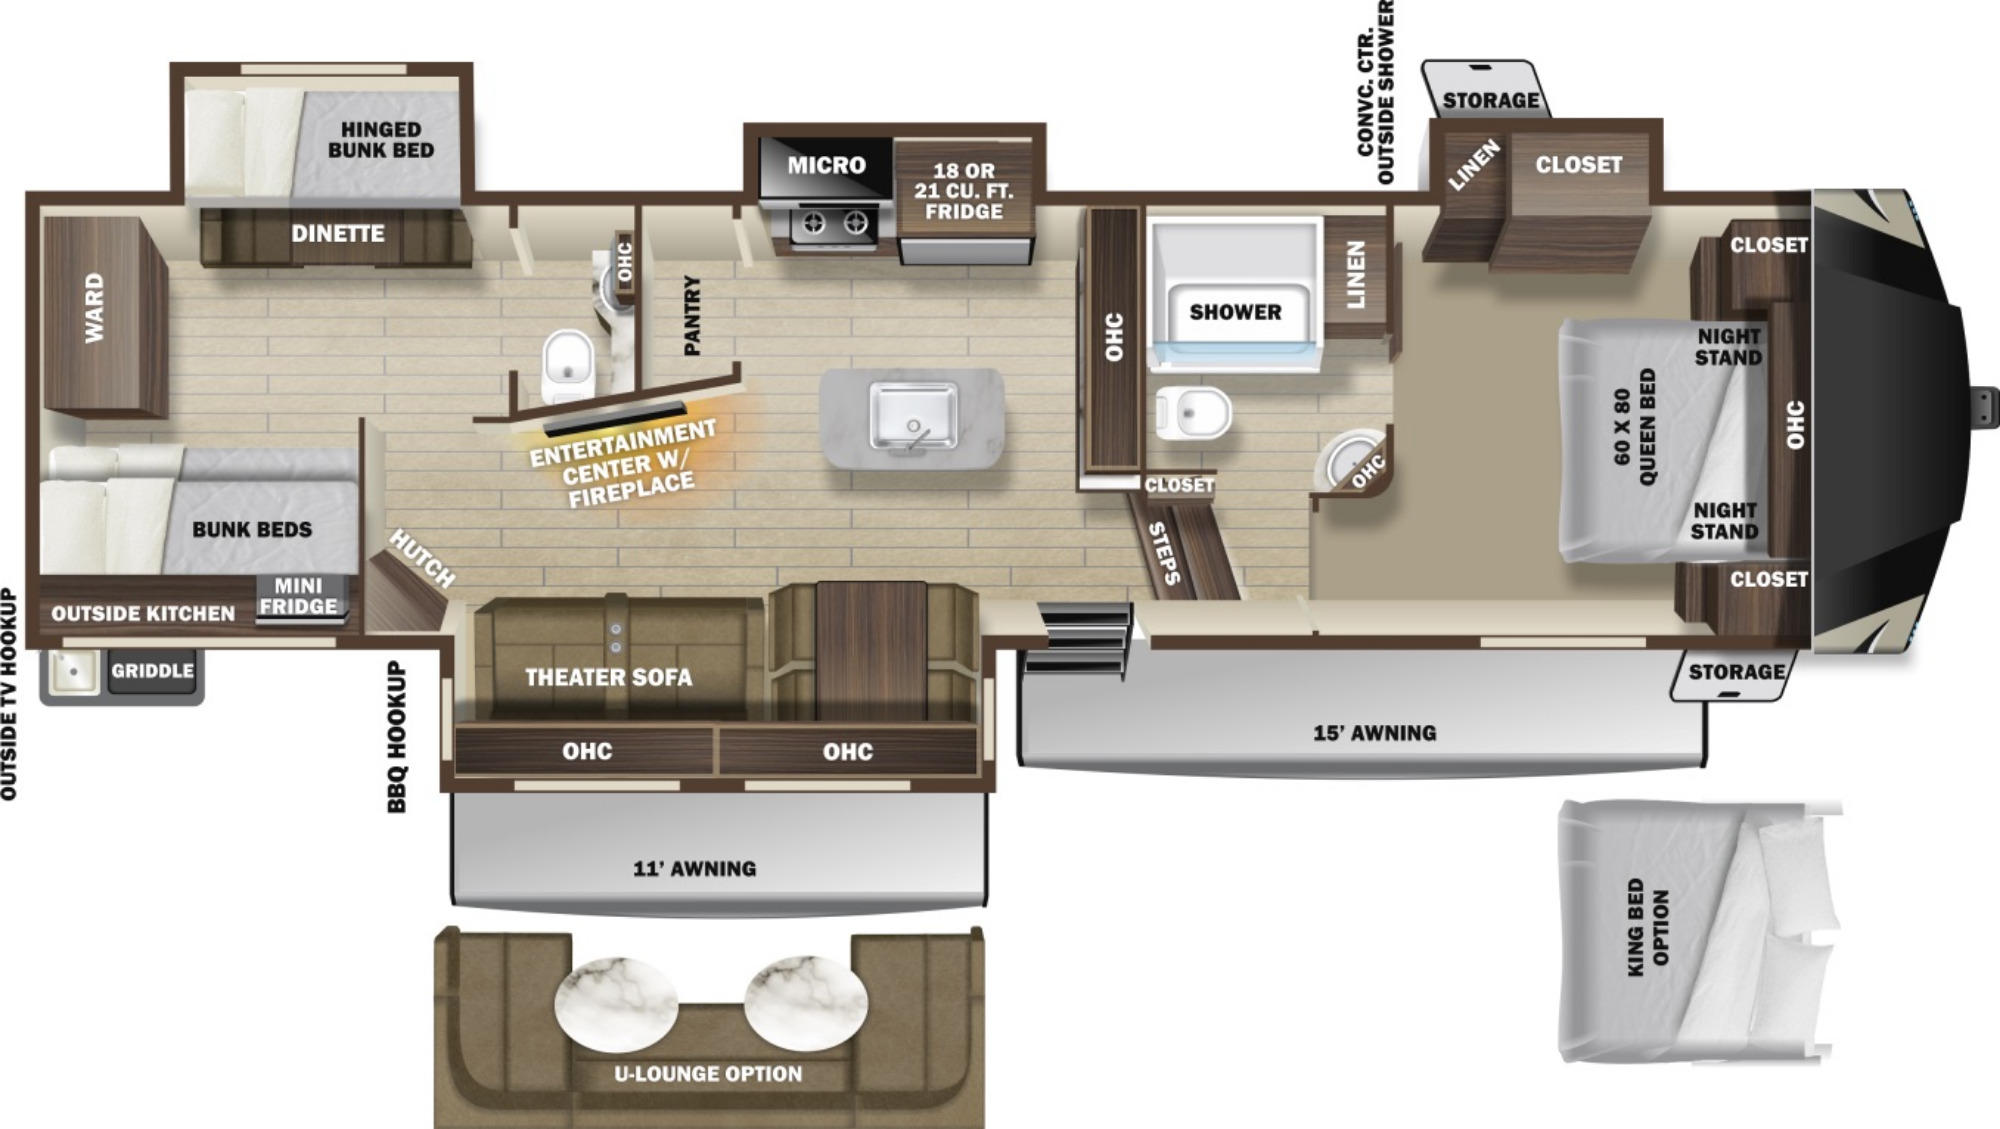 View Floor Plan for 2021 HIGHLAND RIDGE OPEN RANGE 374BHS